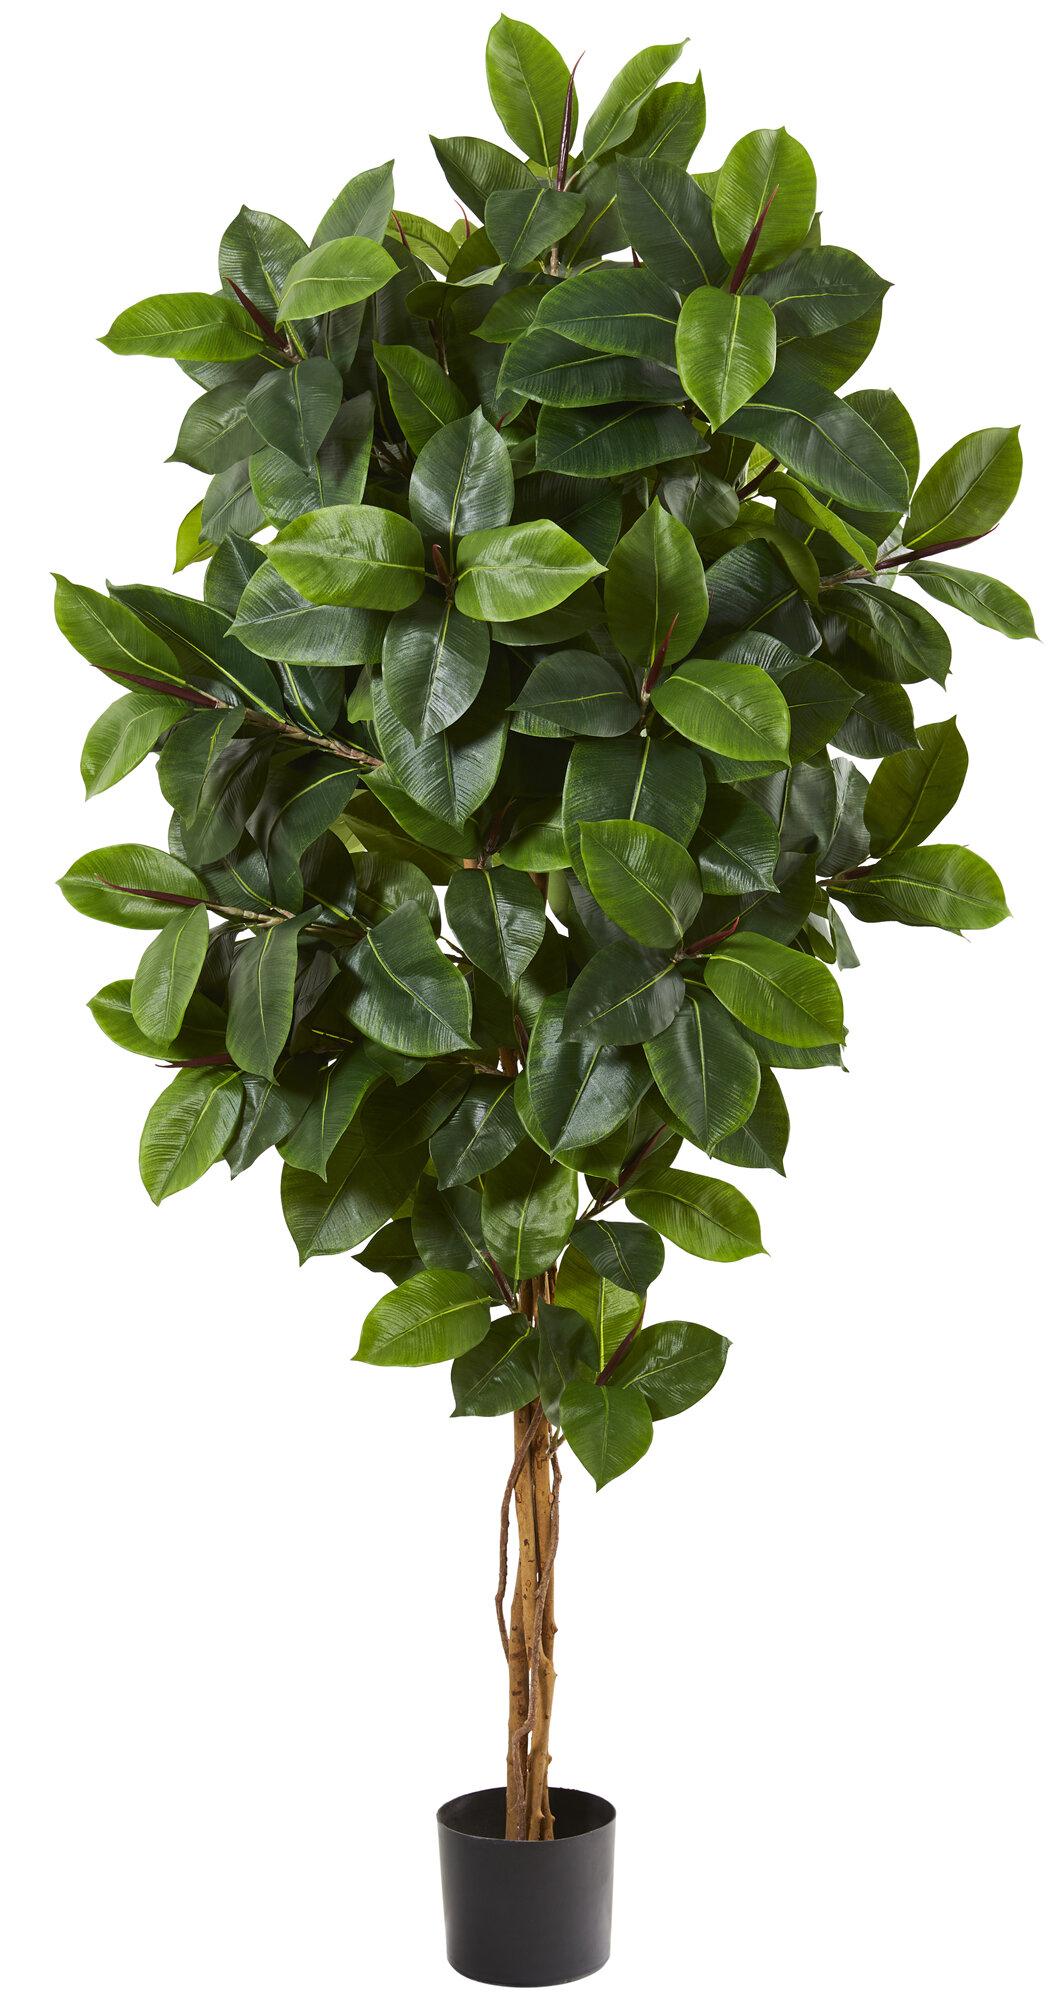 Artificial Rubber Leaf Tree In Pot Liner Joss Main